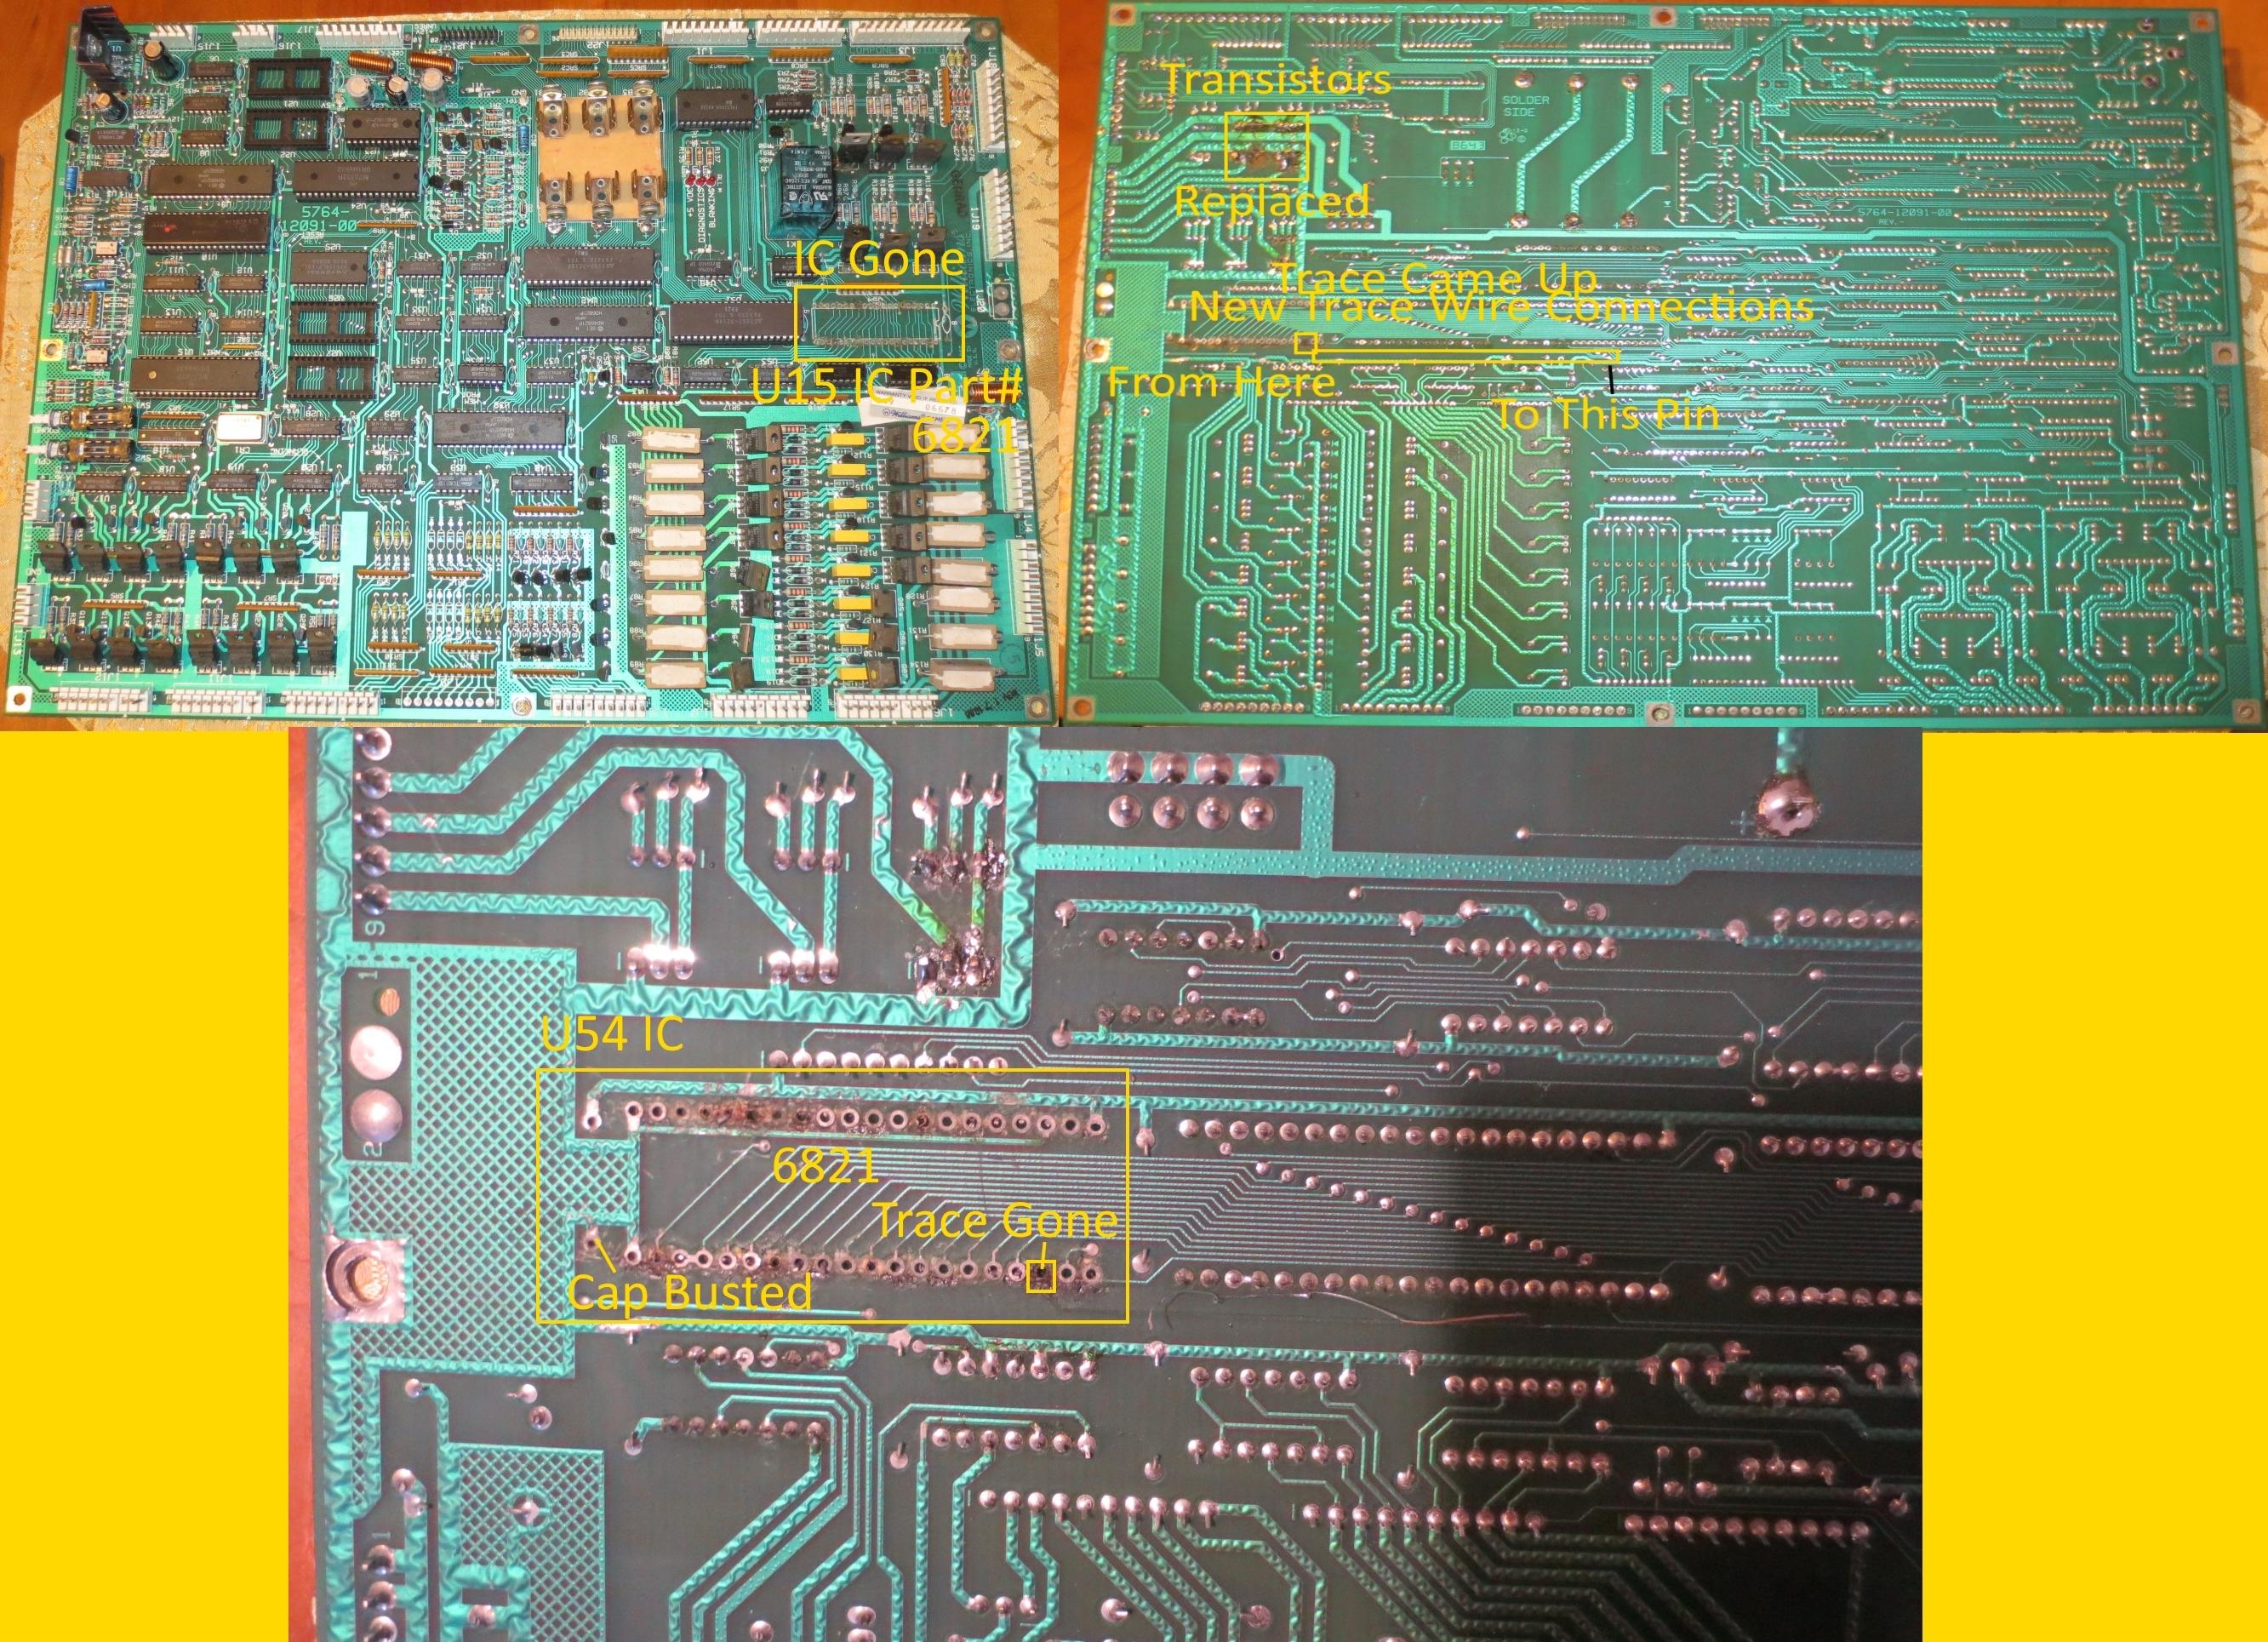 Williams System 11 MPU Board